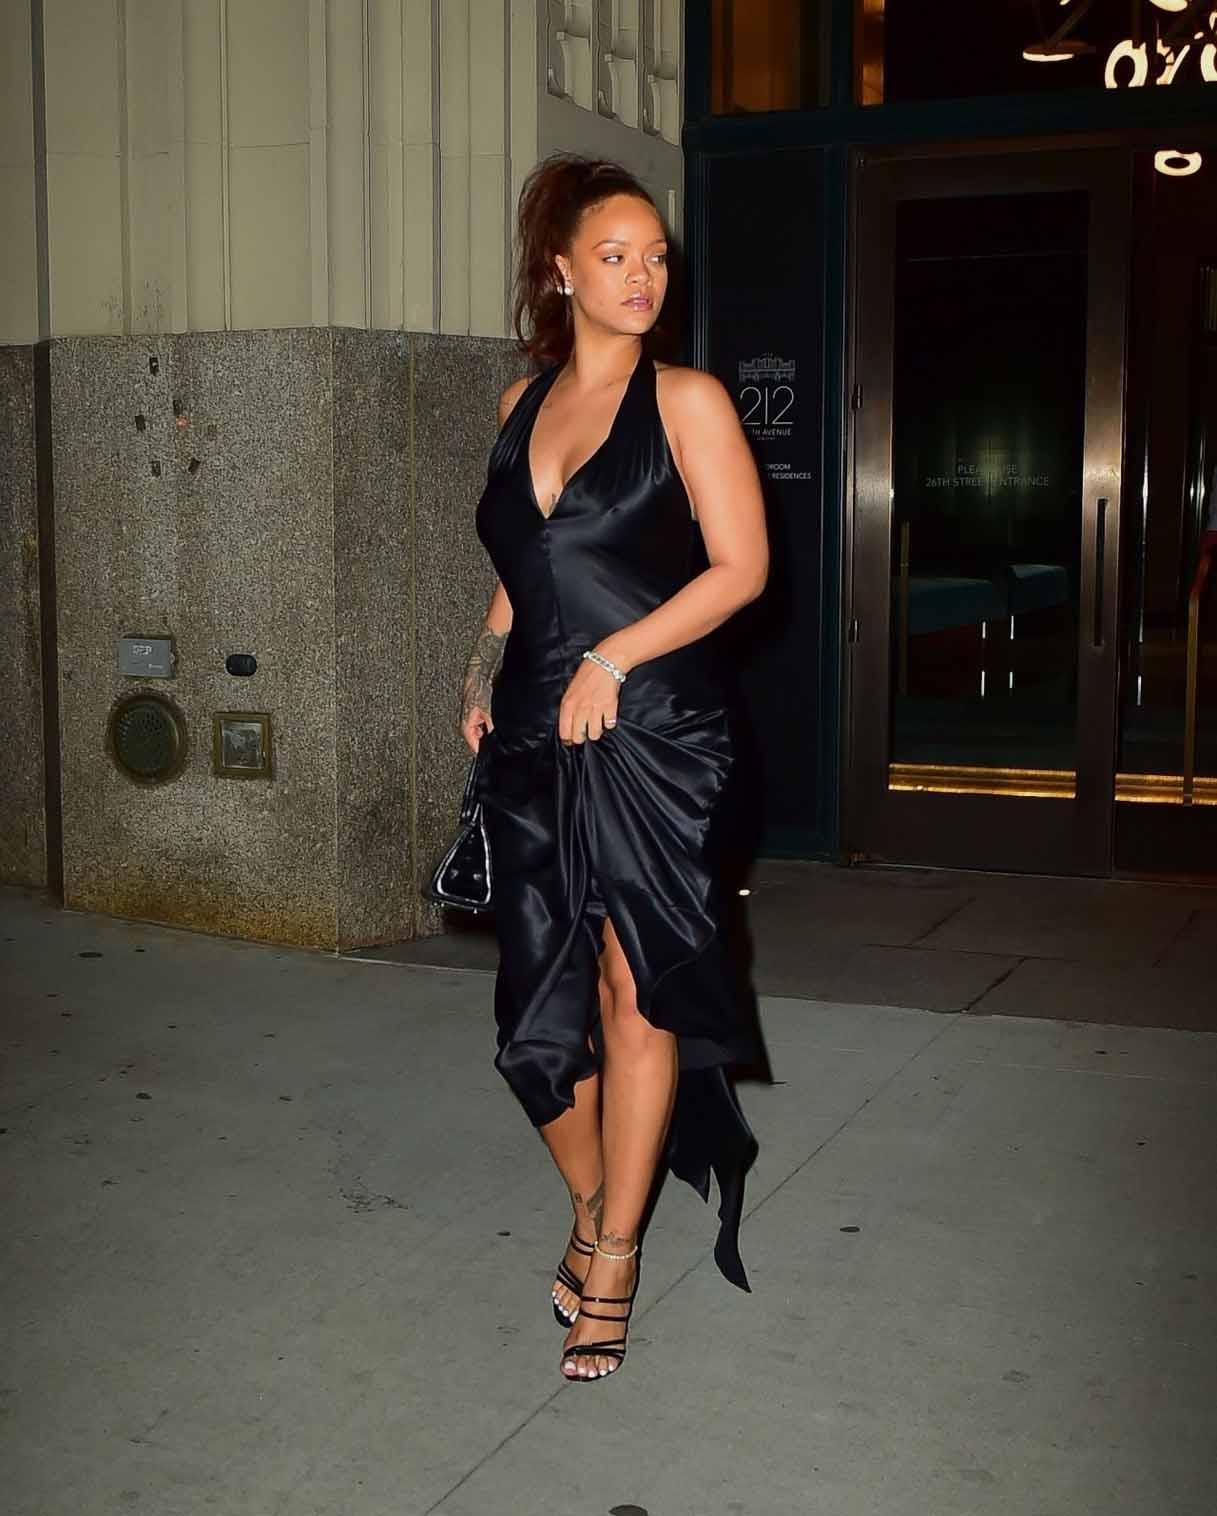 Rihanna Beautiful Black Dress New York 13 06 2019 Celebvegas Rihanna Style Rihanna Black Dress Beautiful Black Dresses [ 1516 x 1217 Pixel ]